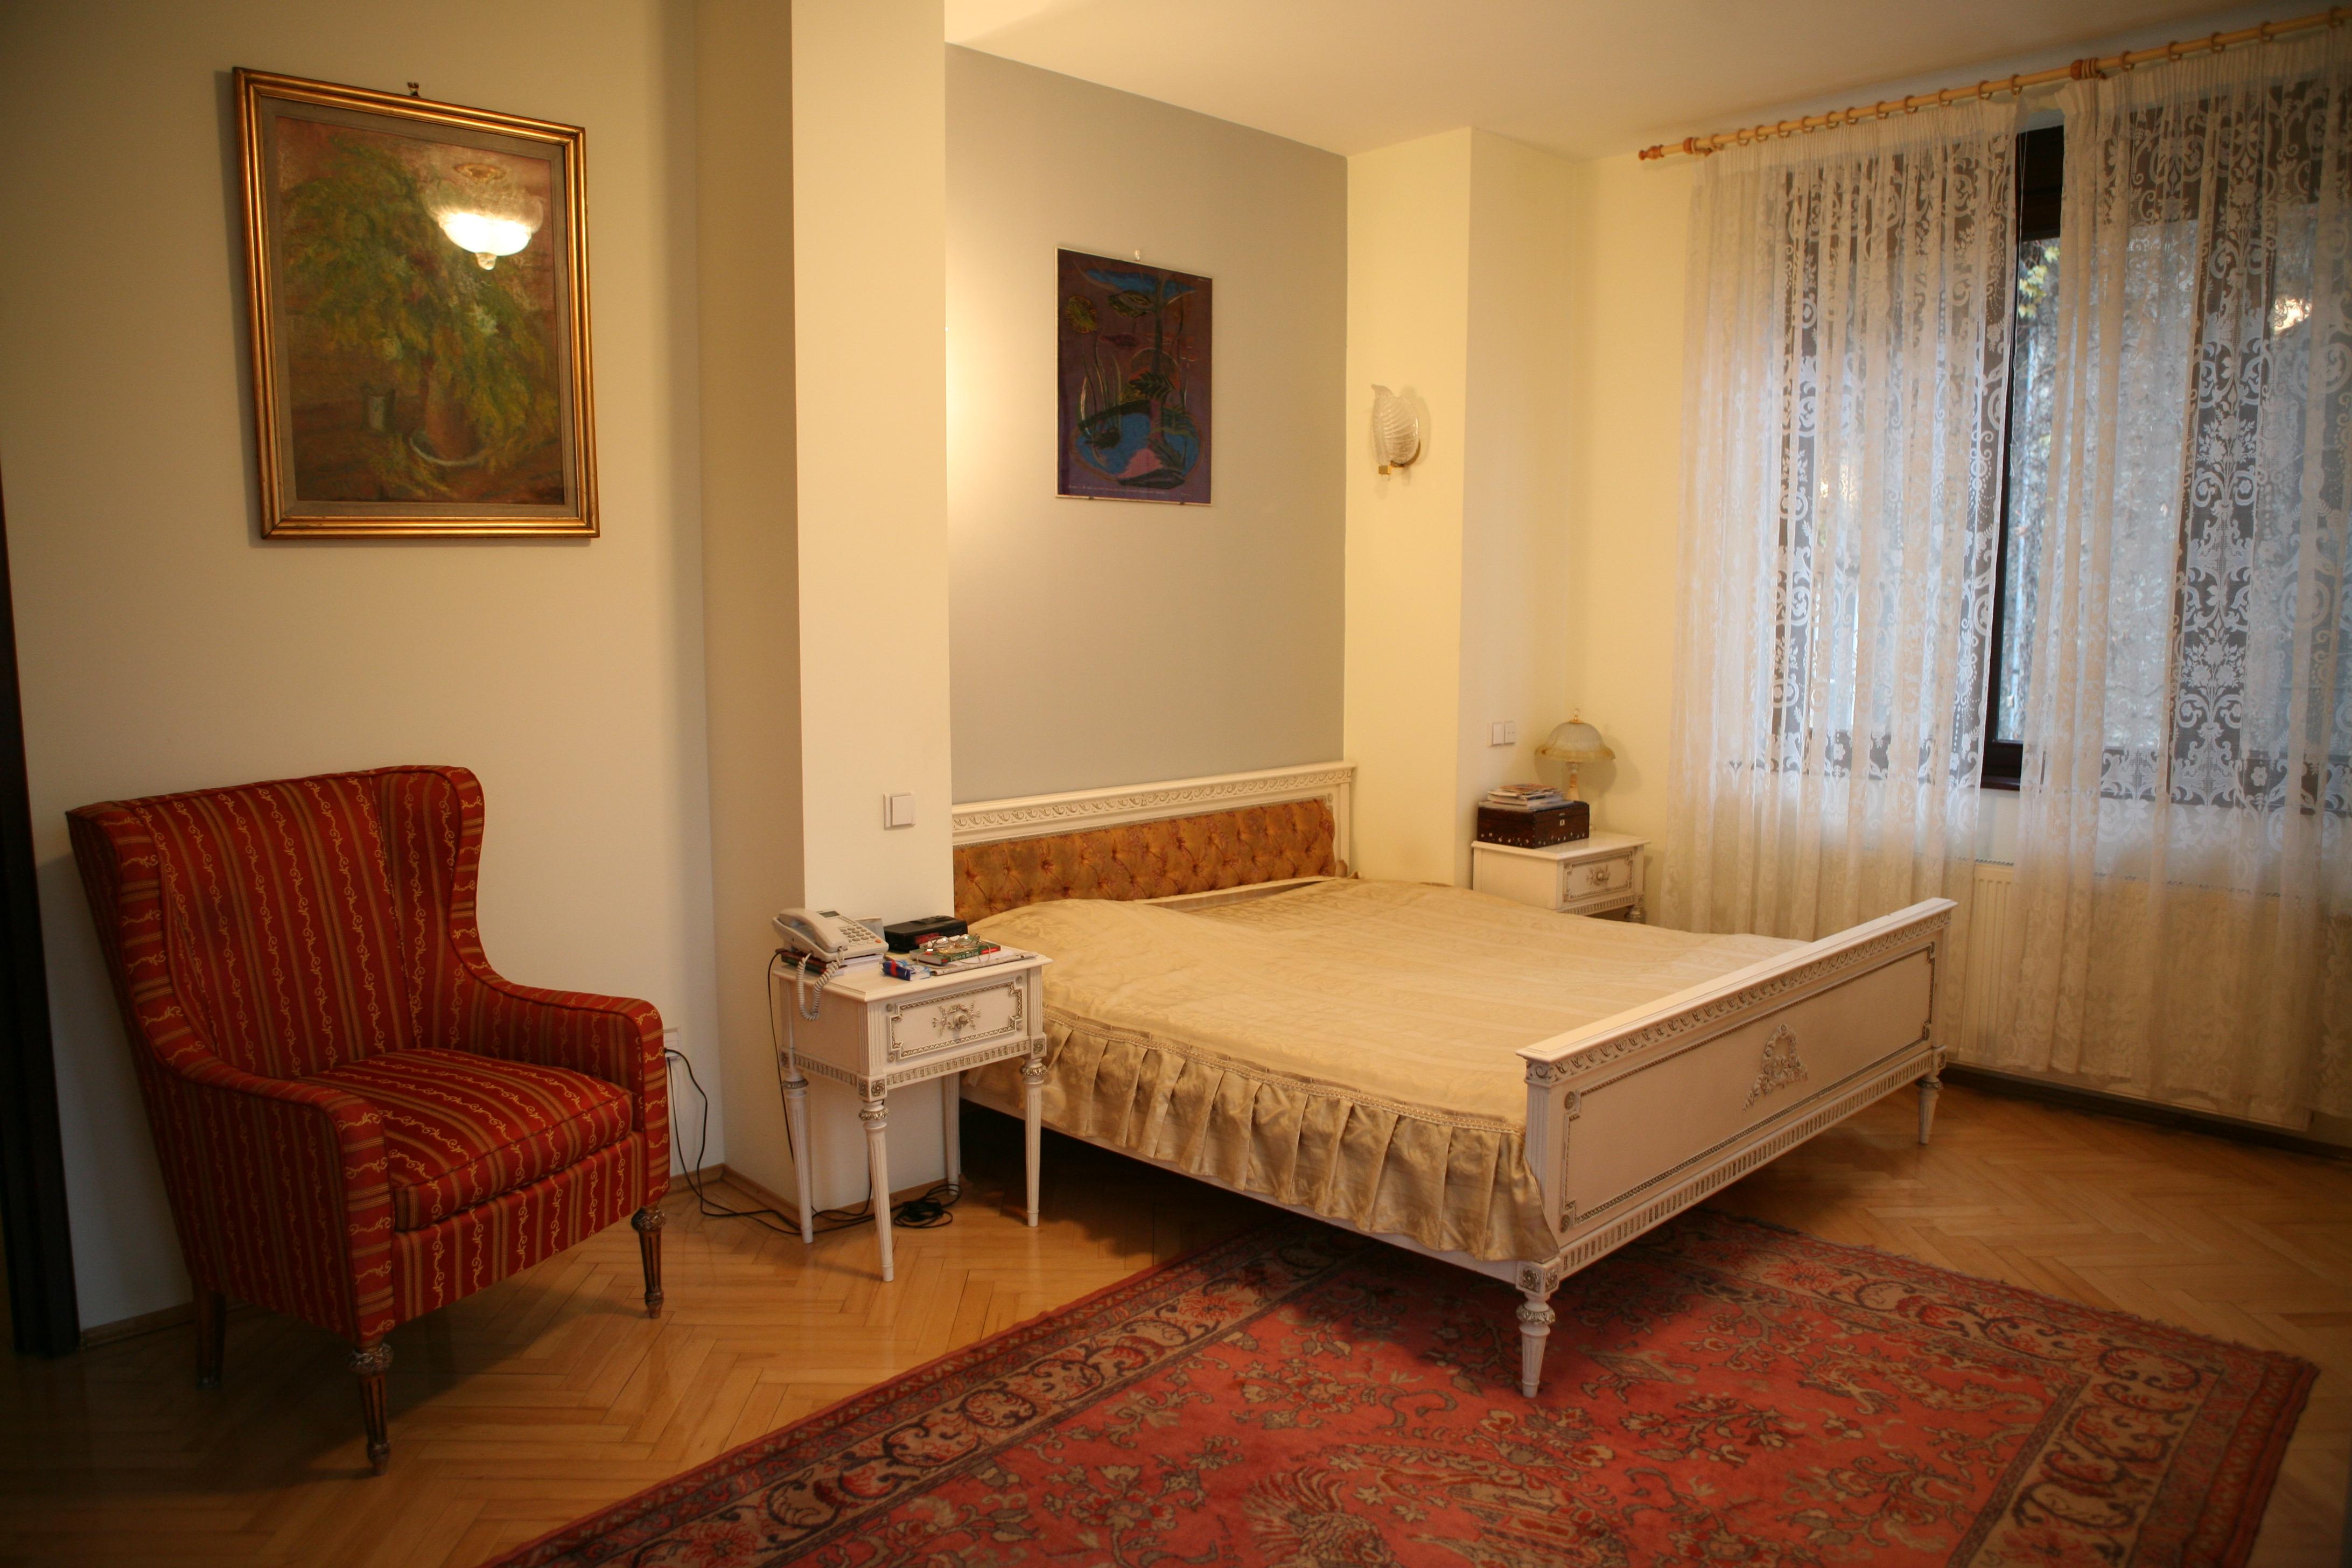 Restaurare Casa L - Bucuresti  - Poza 10